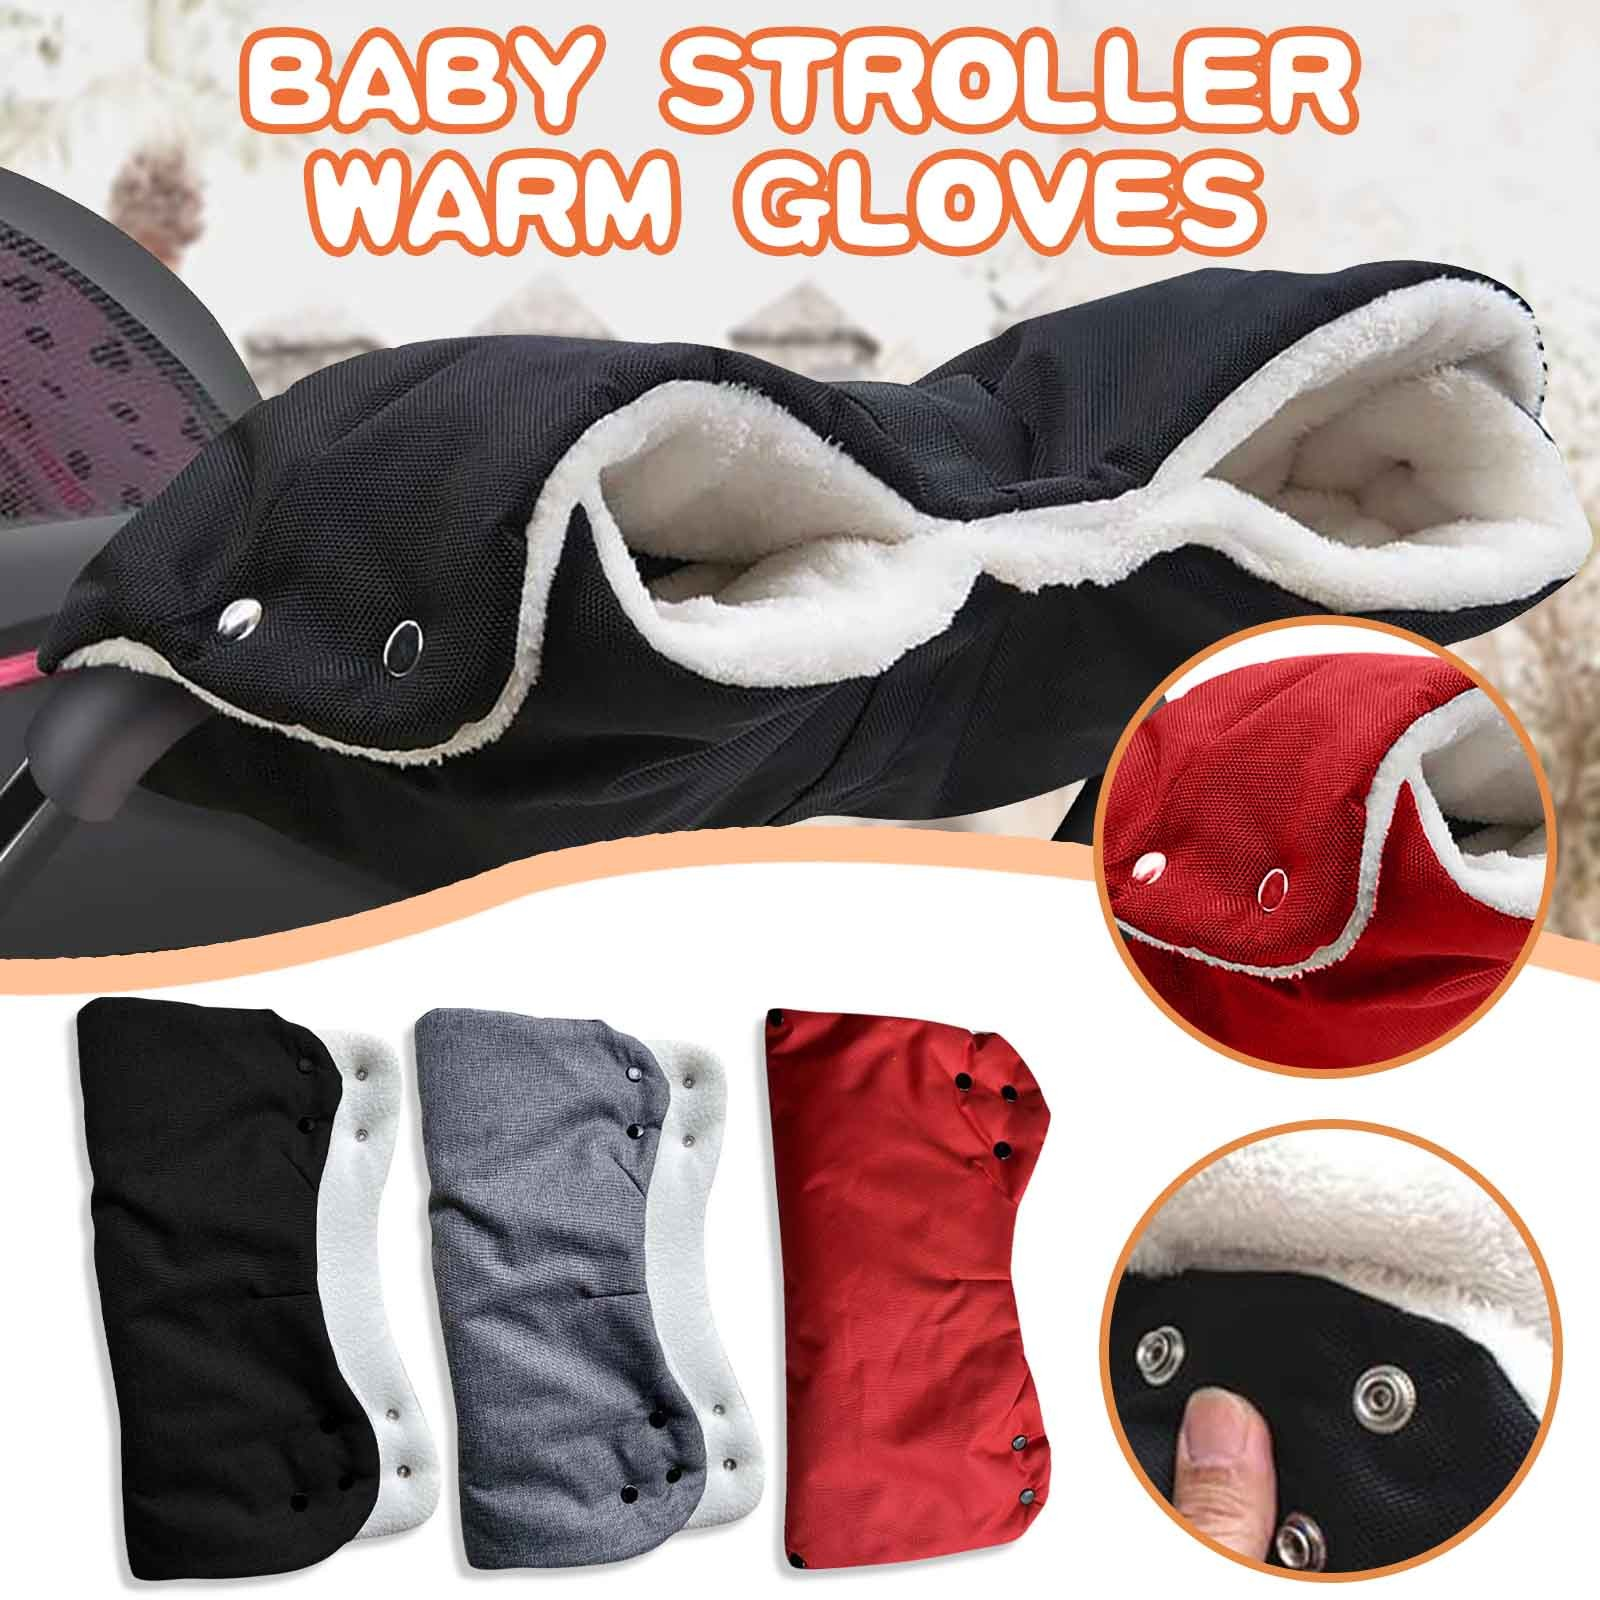 winter Keep Warm stroller gloves baby rider Fleece Hand Keep Warmers Waterproof Windproof Antifreeze Baby wool Trolley Gloves